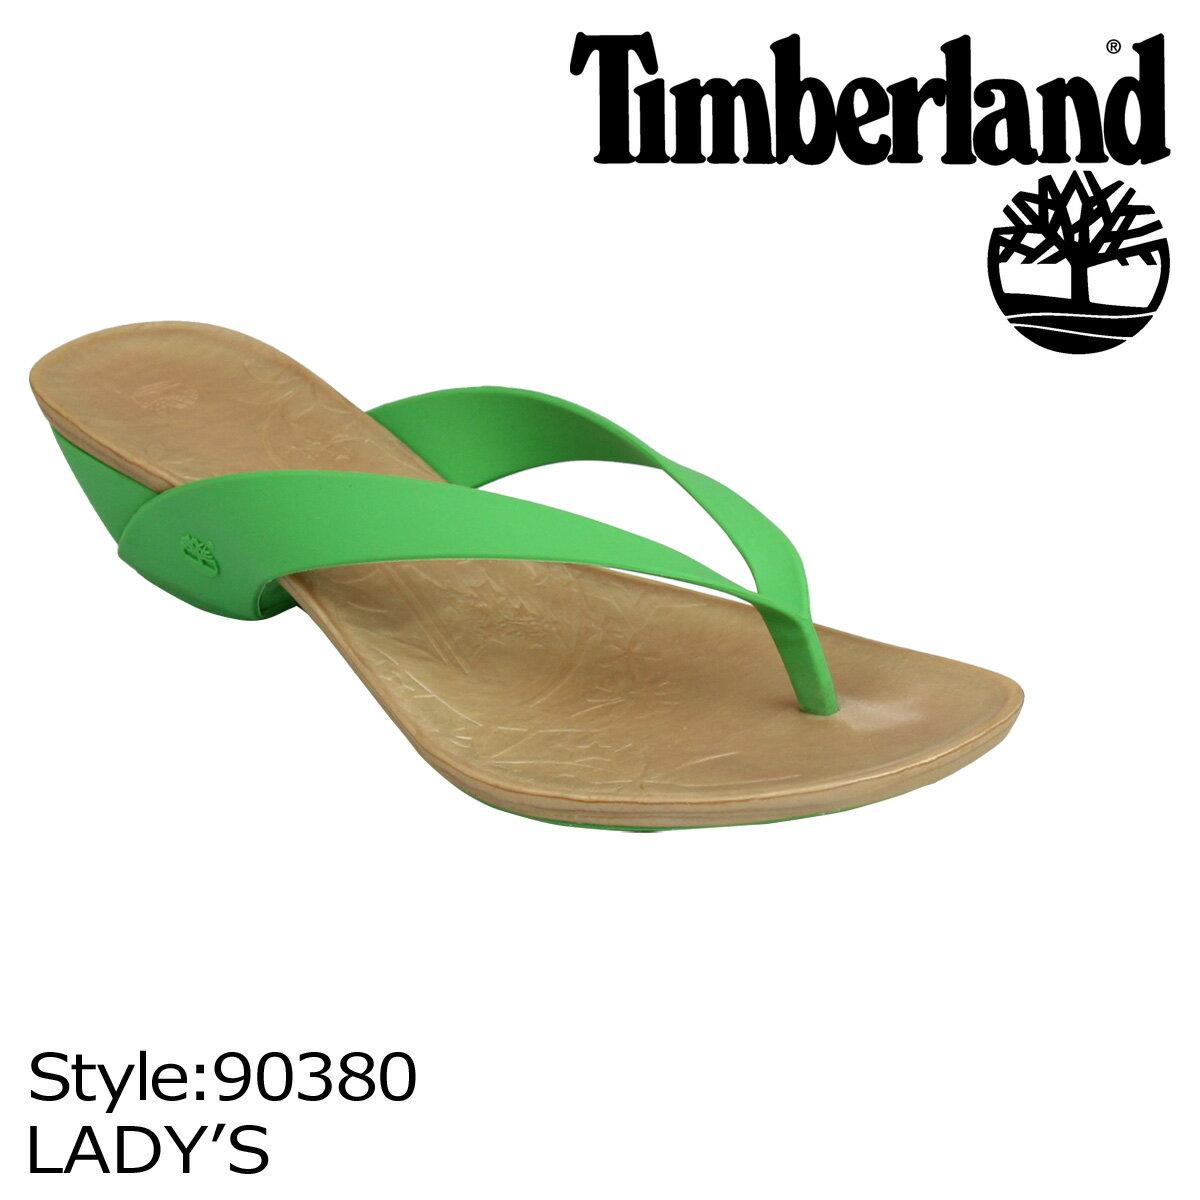 Timberland ティンバーランド レディース WOMEN'S FLIRTATIOUS THONG サンダル トングサンダル 90380 グリーン [9000足]